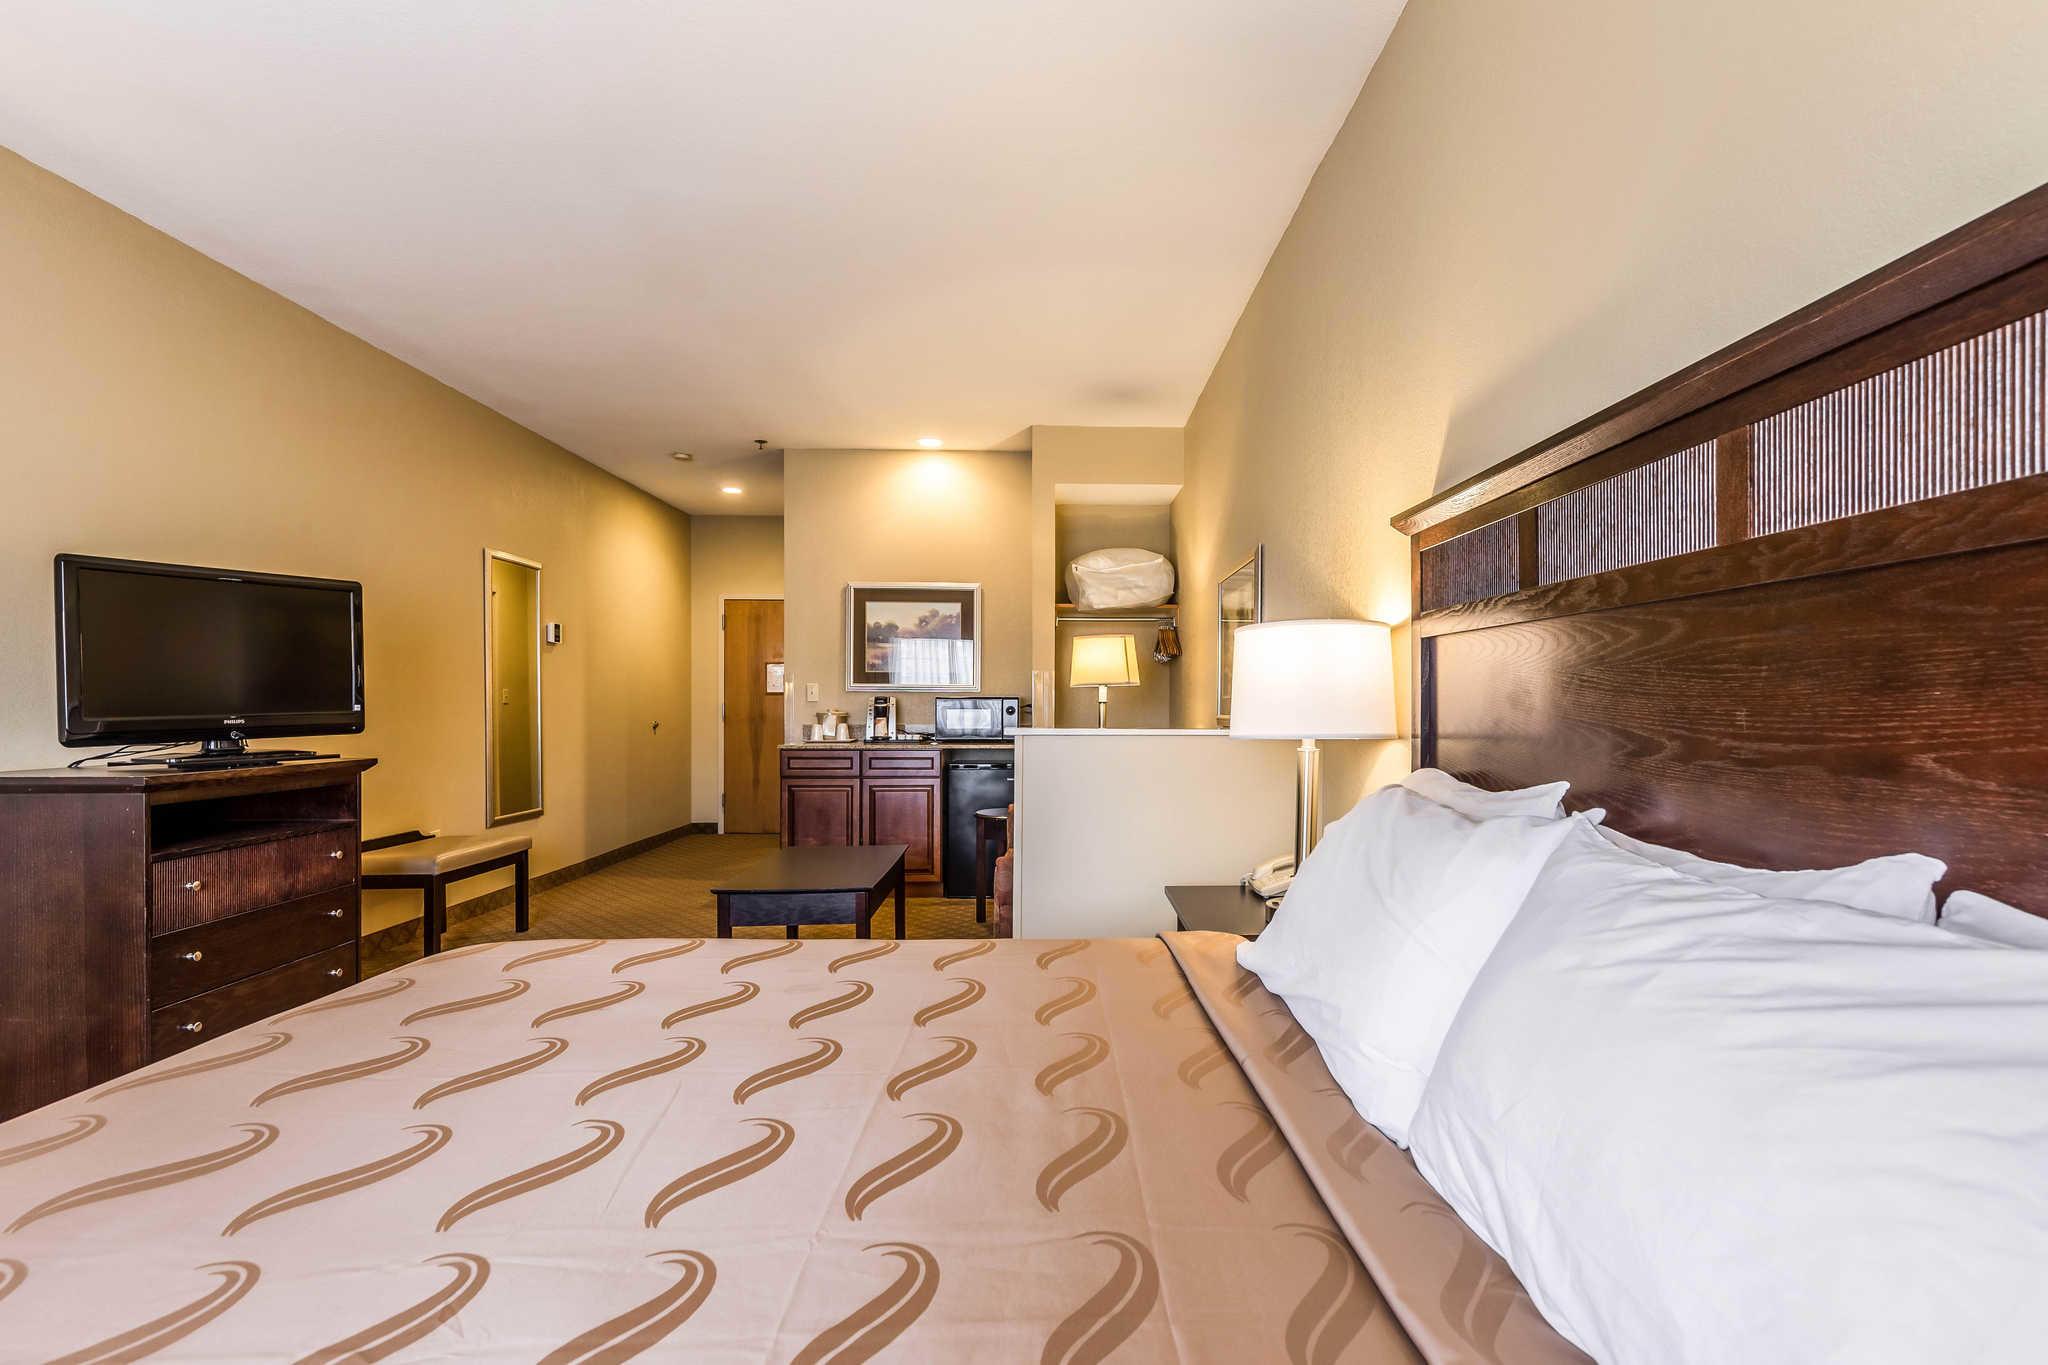 Quality Inn & Suites image 19